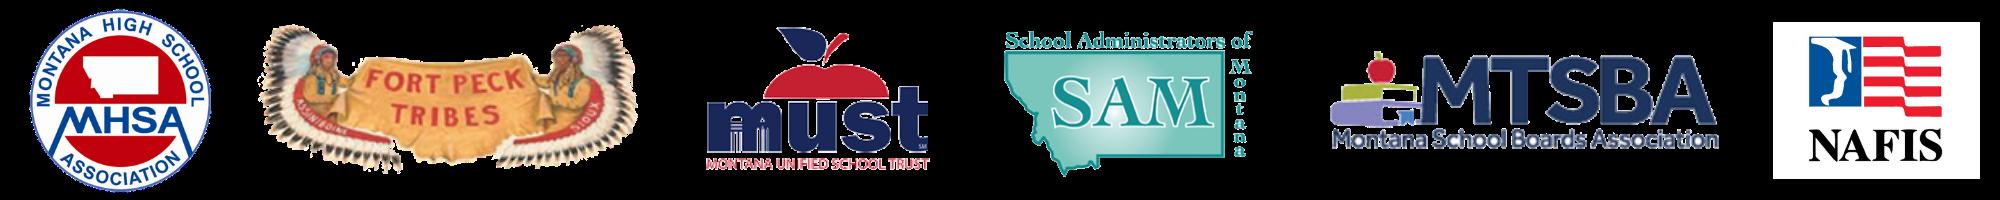 Community Partner Logos; MHSA, Fort Peck Tribes, MUST, SAM, MTSBA, NAFIS